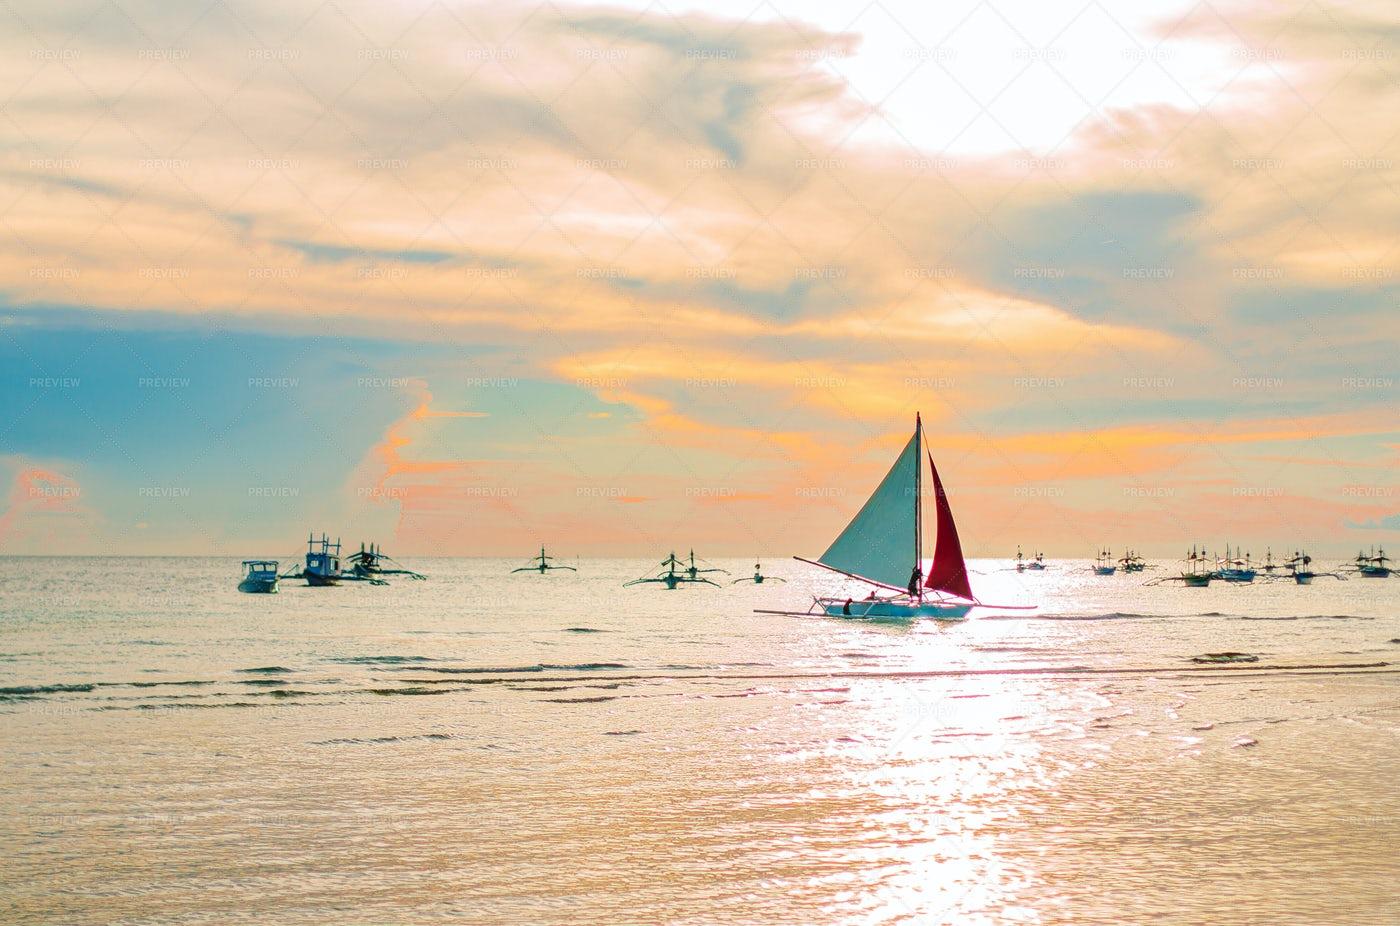 Sailing Boat At Sunset: Stock Photos